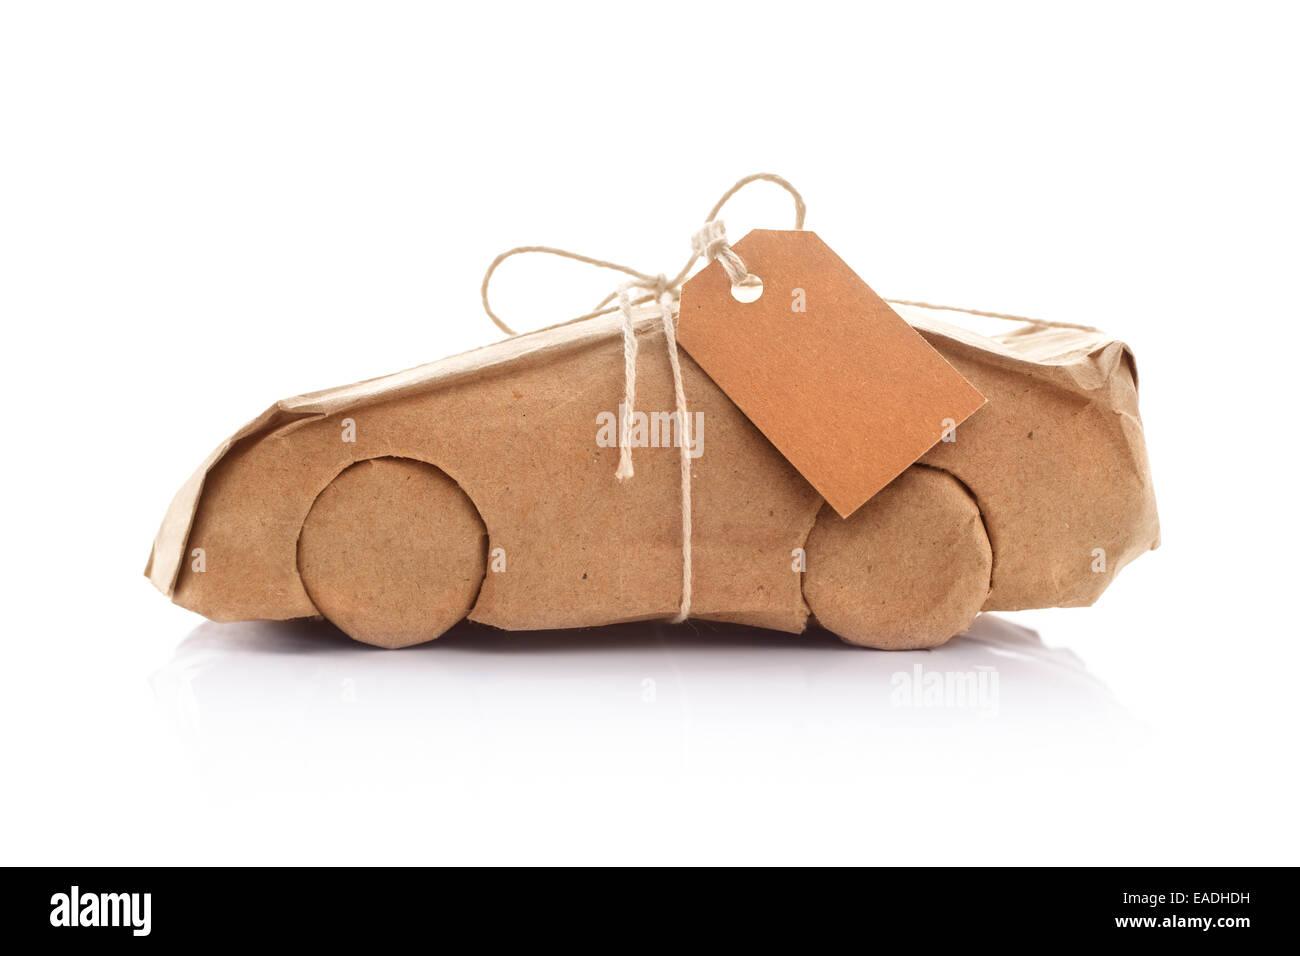 Coche envuelto en papel marrón Imagen De Stock